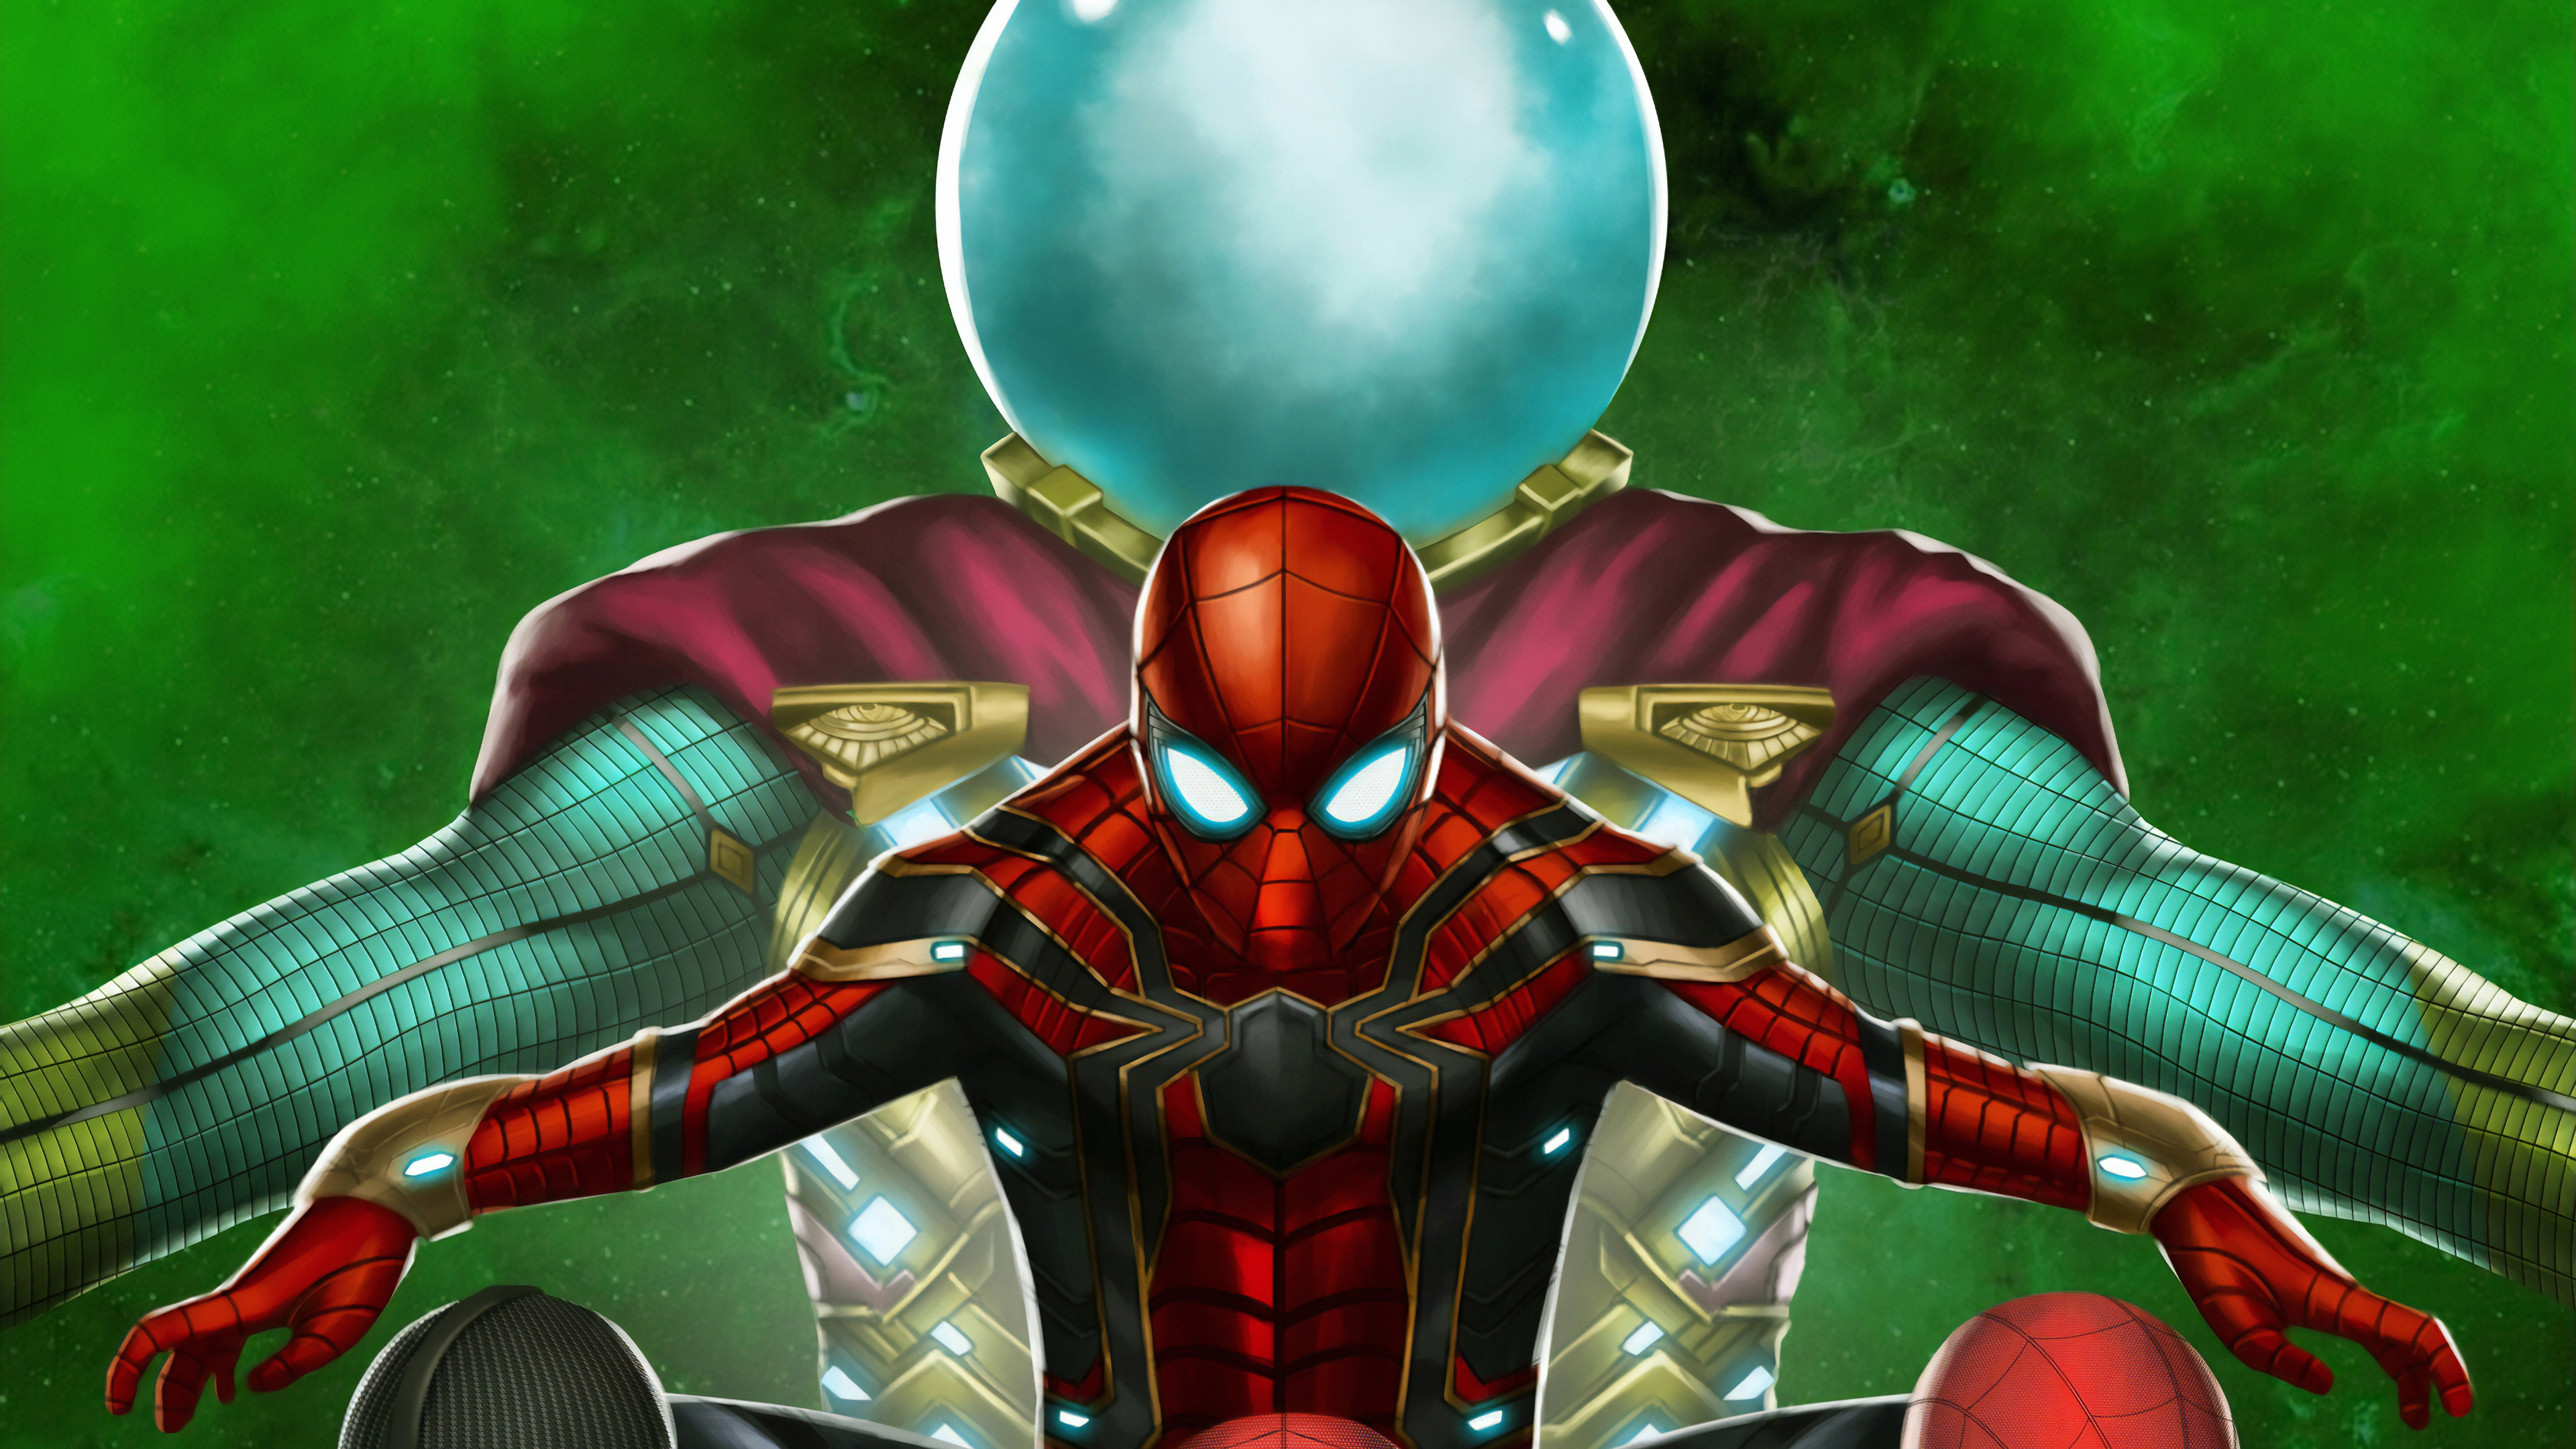 spiderman vs mysterio new 1565053596 - Spiderman Vs Mysterio New - superheroes wallpapers, spiderman wallpapers, spiderman far from home wallpapers, mysterio wallpapers, hd-wallpapers, digital art wallpapers, artwork wallpapers, 4k-wallpapers